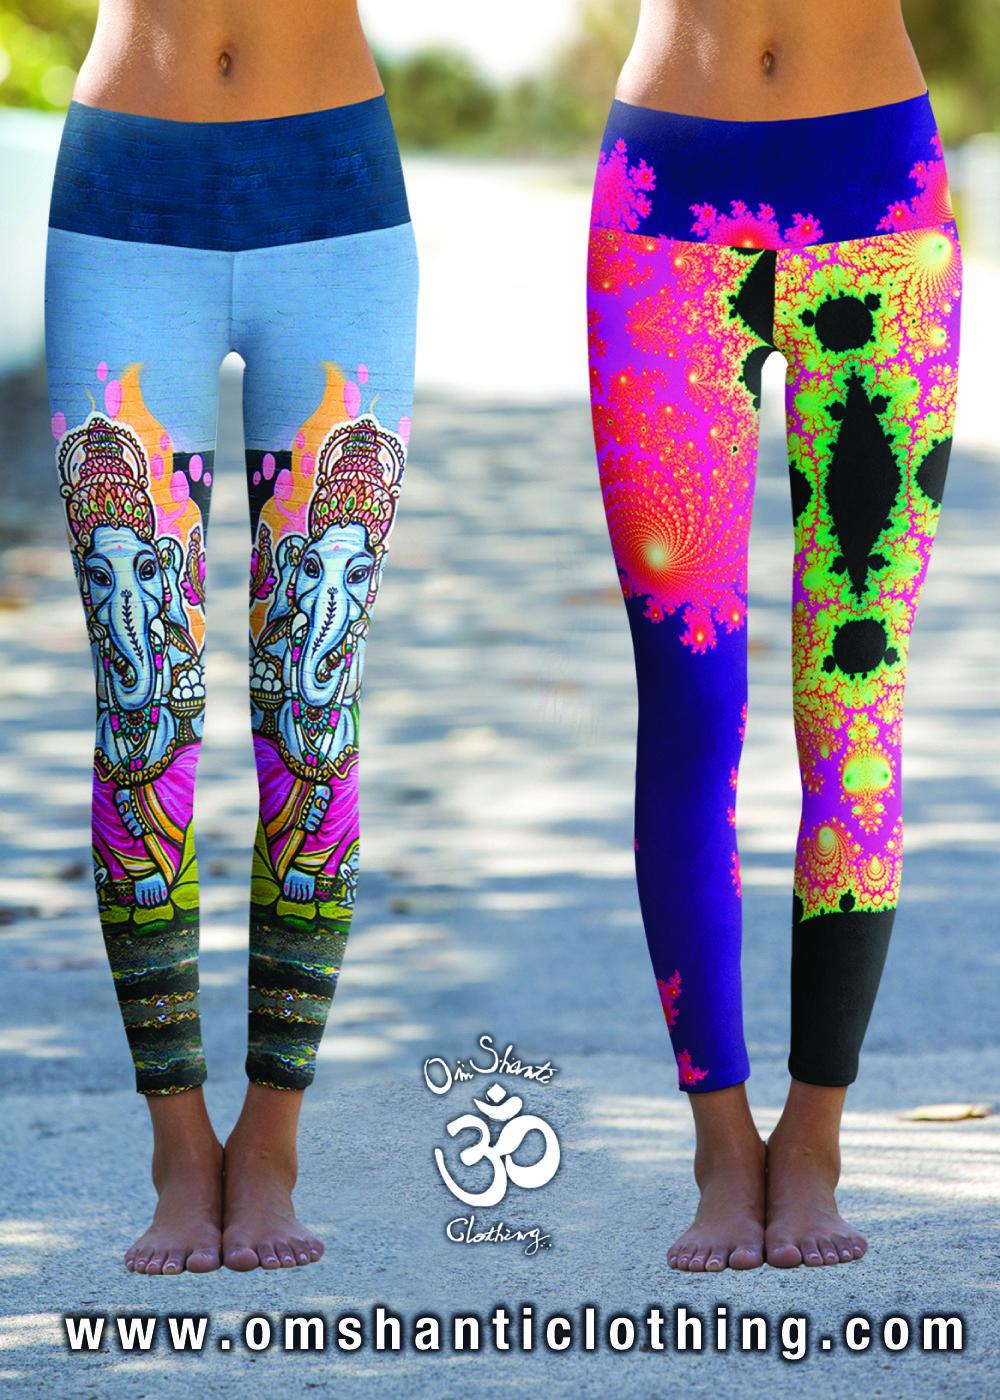 e972dba836c85 Live the Joy with Om Shanti Power Pants available online at  OmShantiClothing.com #Yoga #Leggings